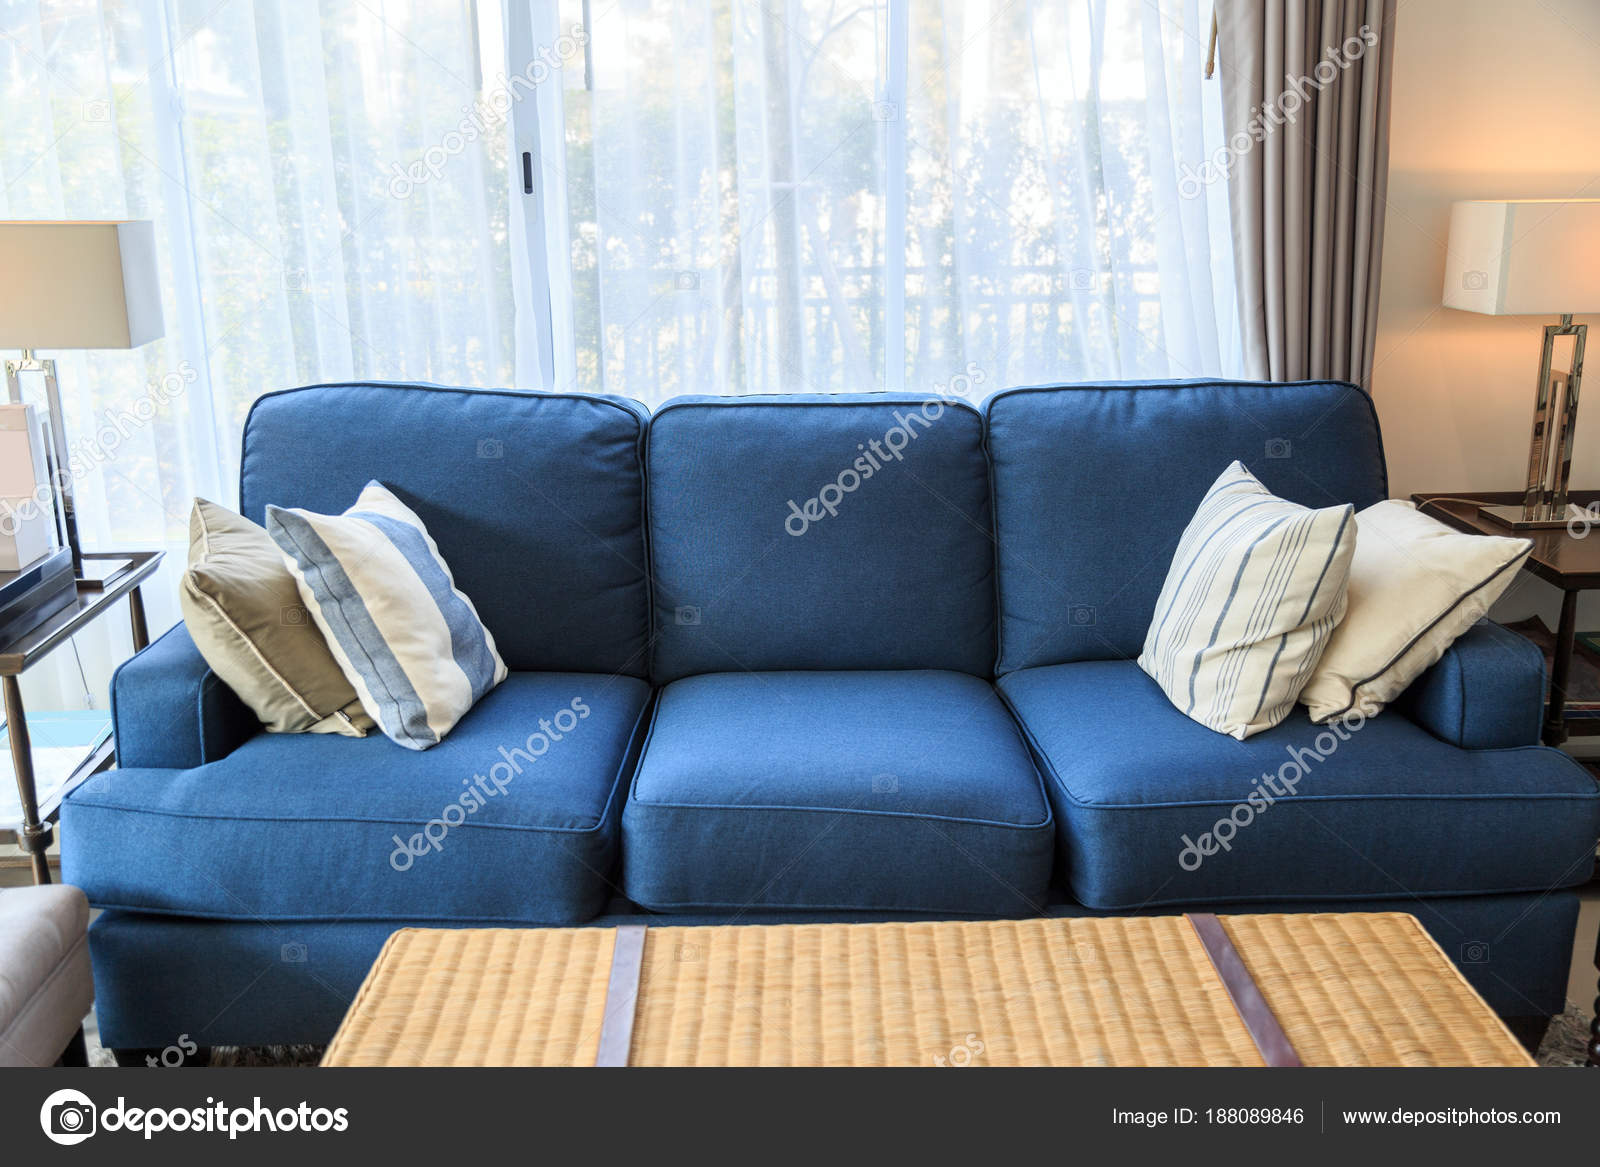 Cuscini Per Divano Blu.A Pillows On A Blue Sofa With Lamp In Livingroom Stock Photo